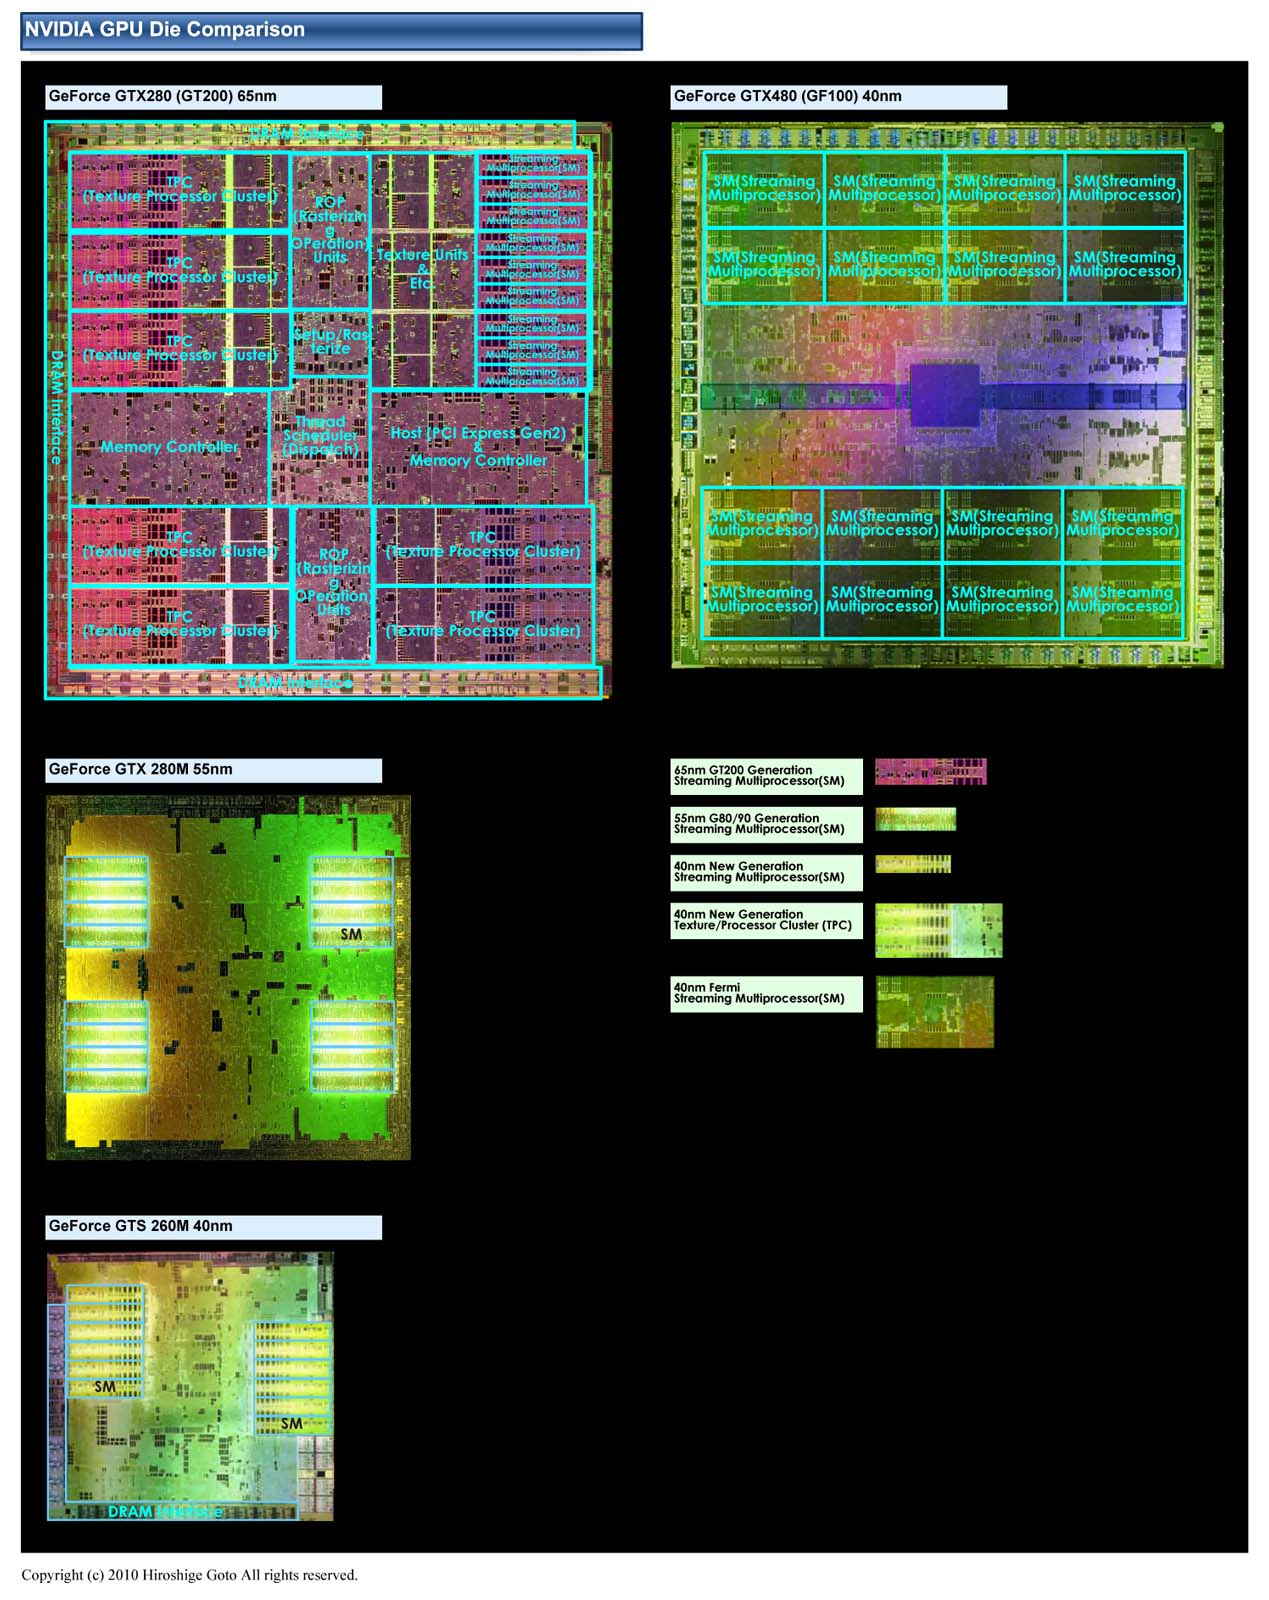 "GF100、GT200ダイの比較<br>PDF版は<a class=""resource"" ipw_status=""2"" ipw_linktype=""filelink_raw"" ipw_id=""789962"" href=""/video/pcw/docs/378/869/p05.pdf"">こちら</a>"